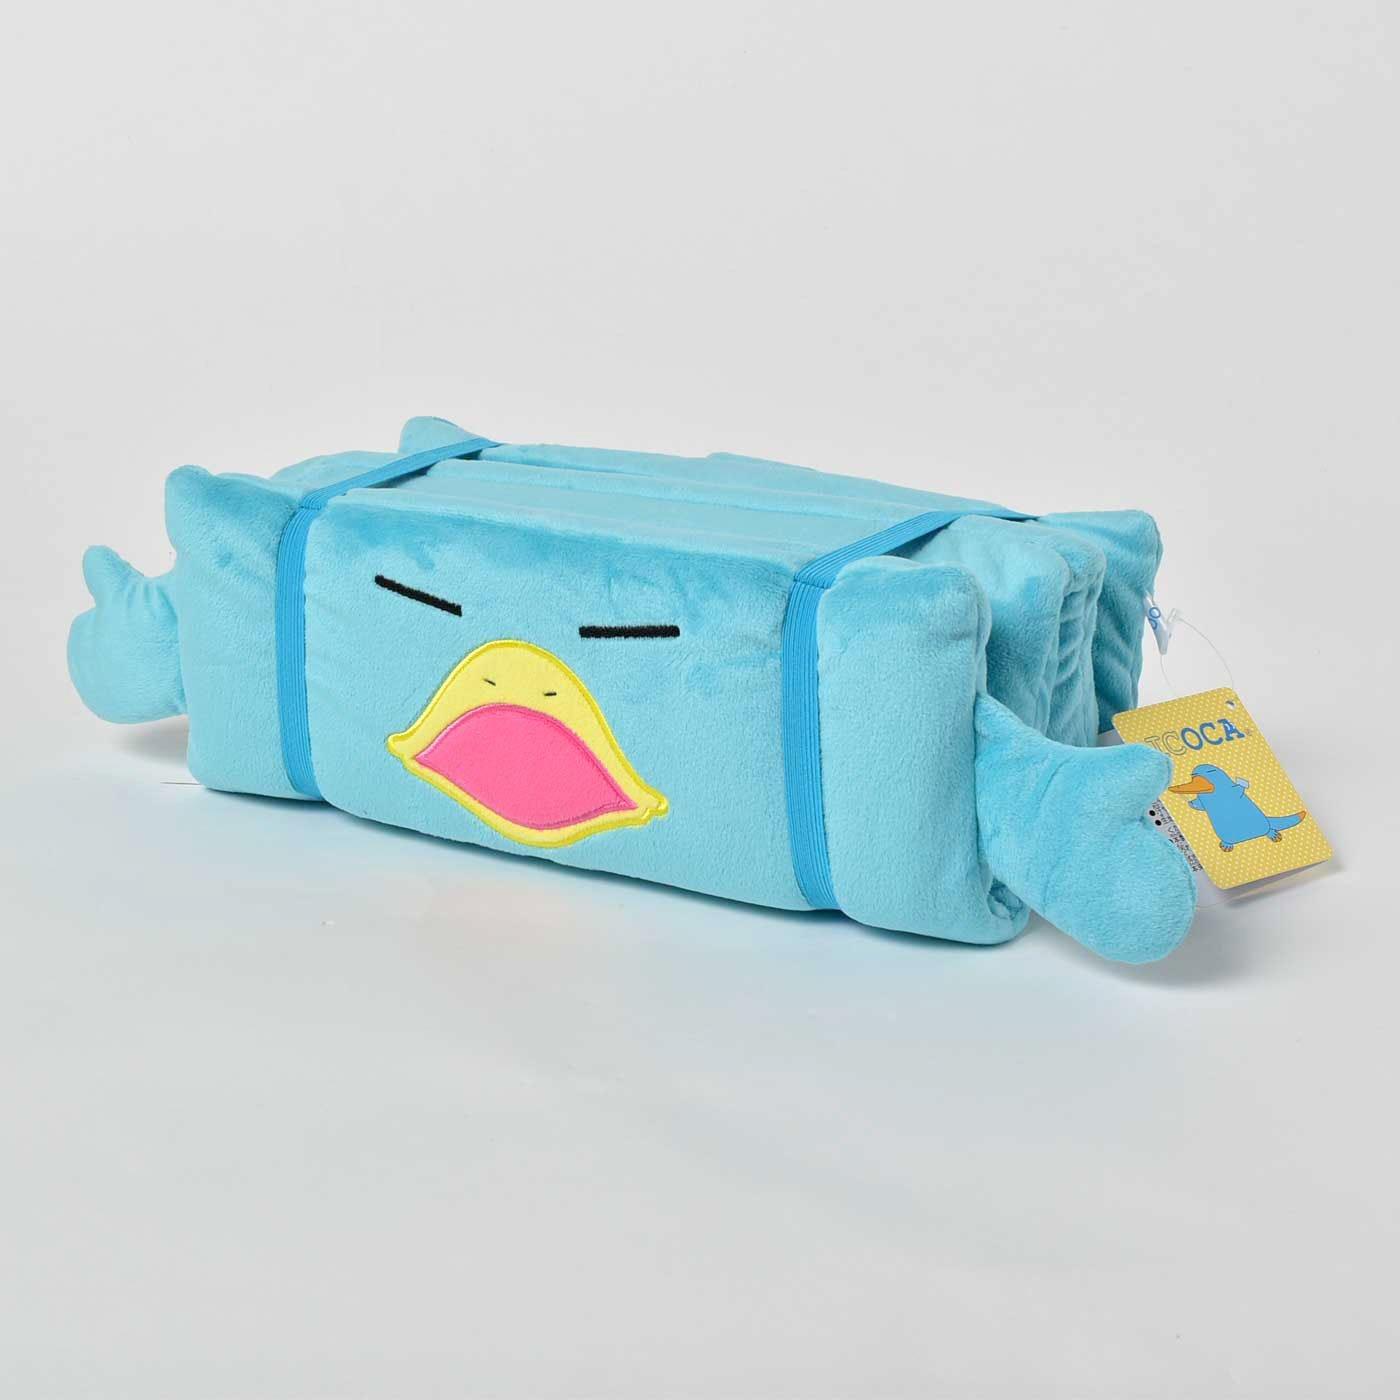 [JR西日本]カモノハシのイコちゃん 折りたたみクッション